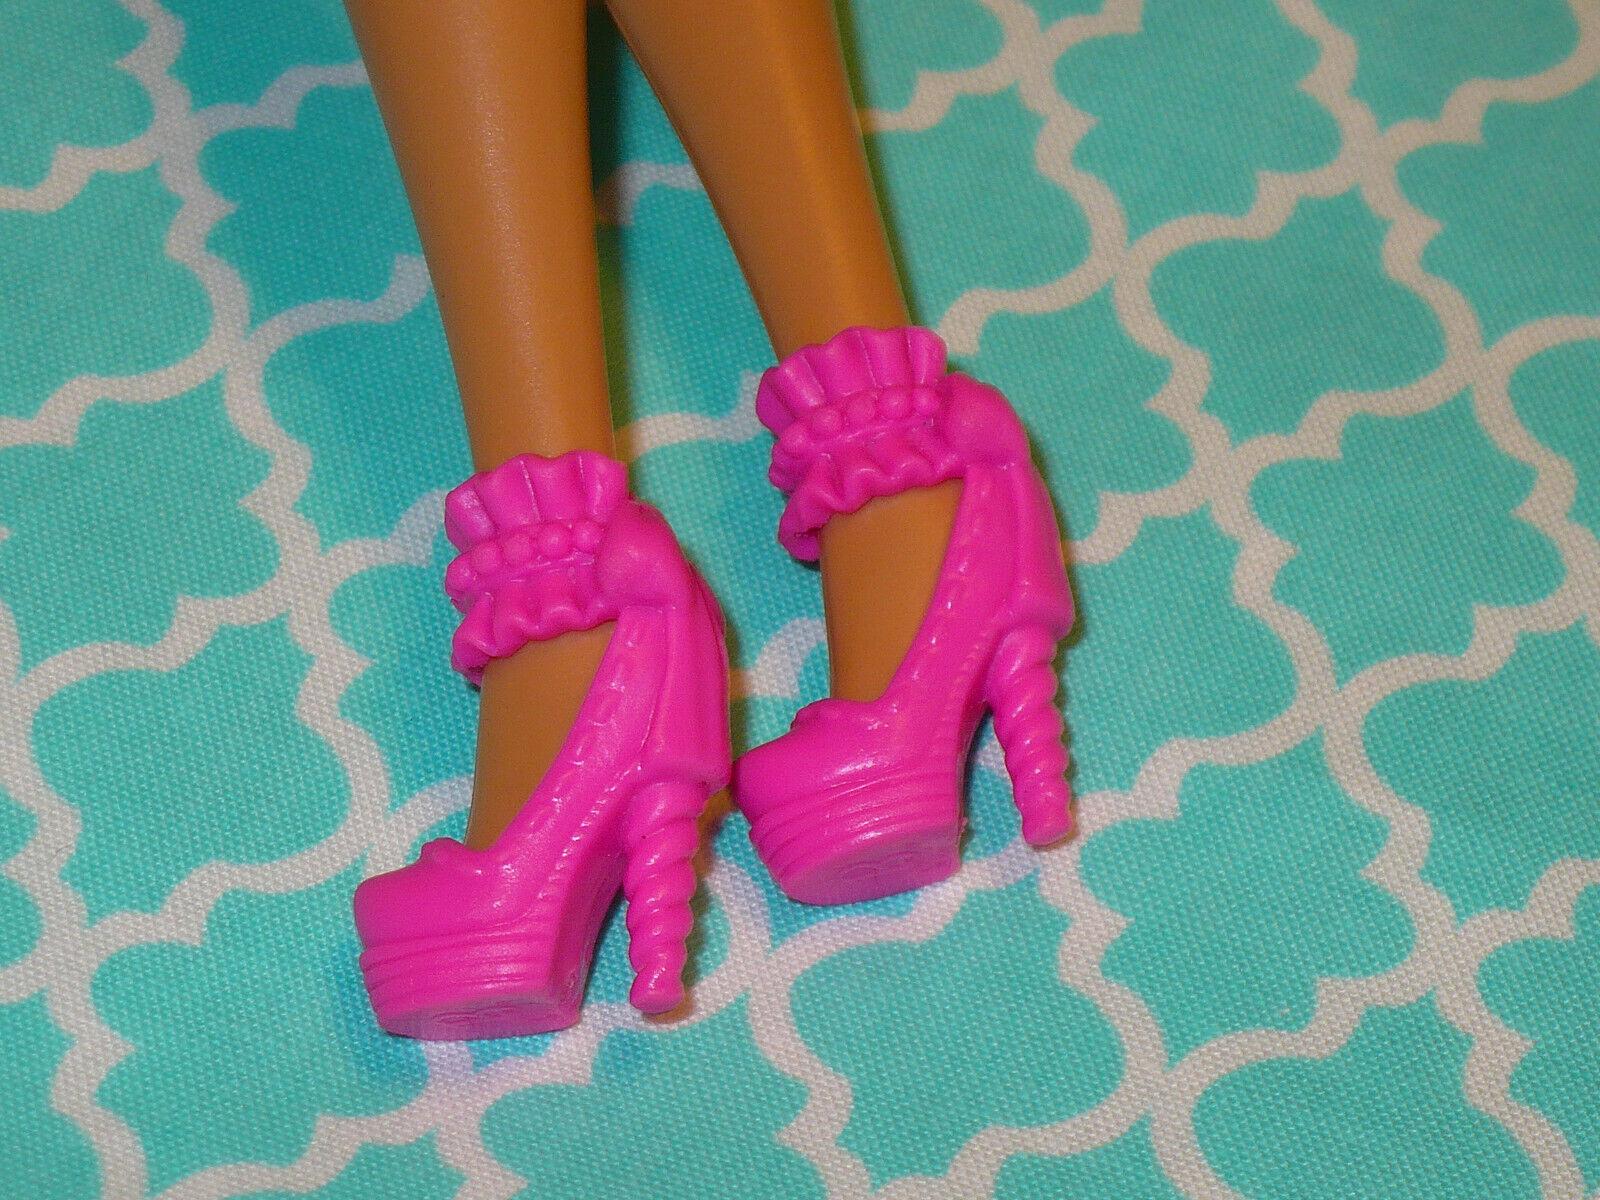 Mattel Barbie Doll Shoes FASHIONISTAS FASHION FEVER PINK FANCY HIGH HEELS - $10.39